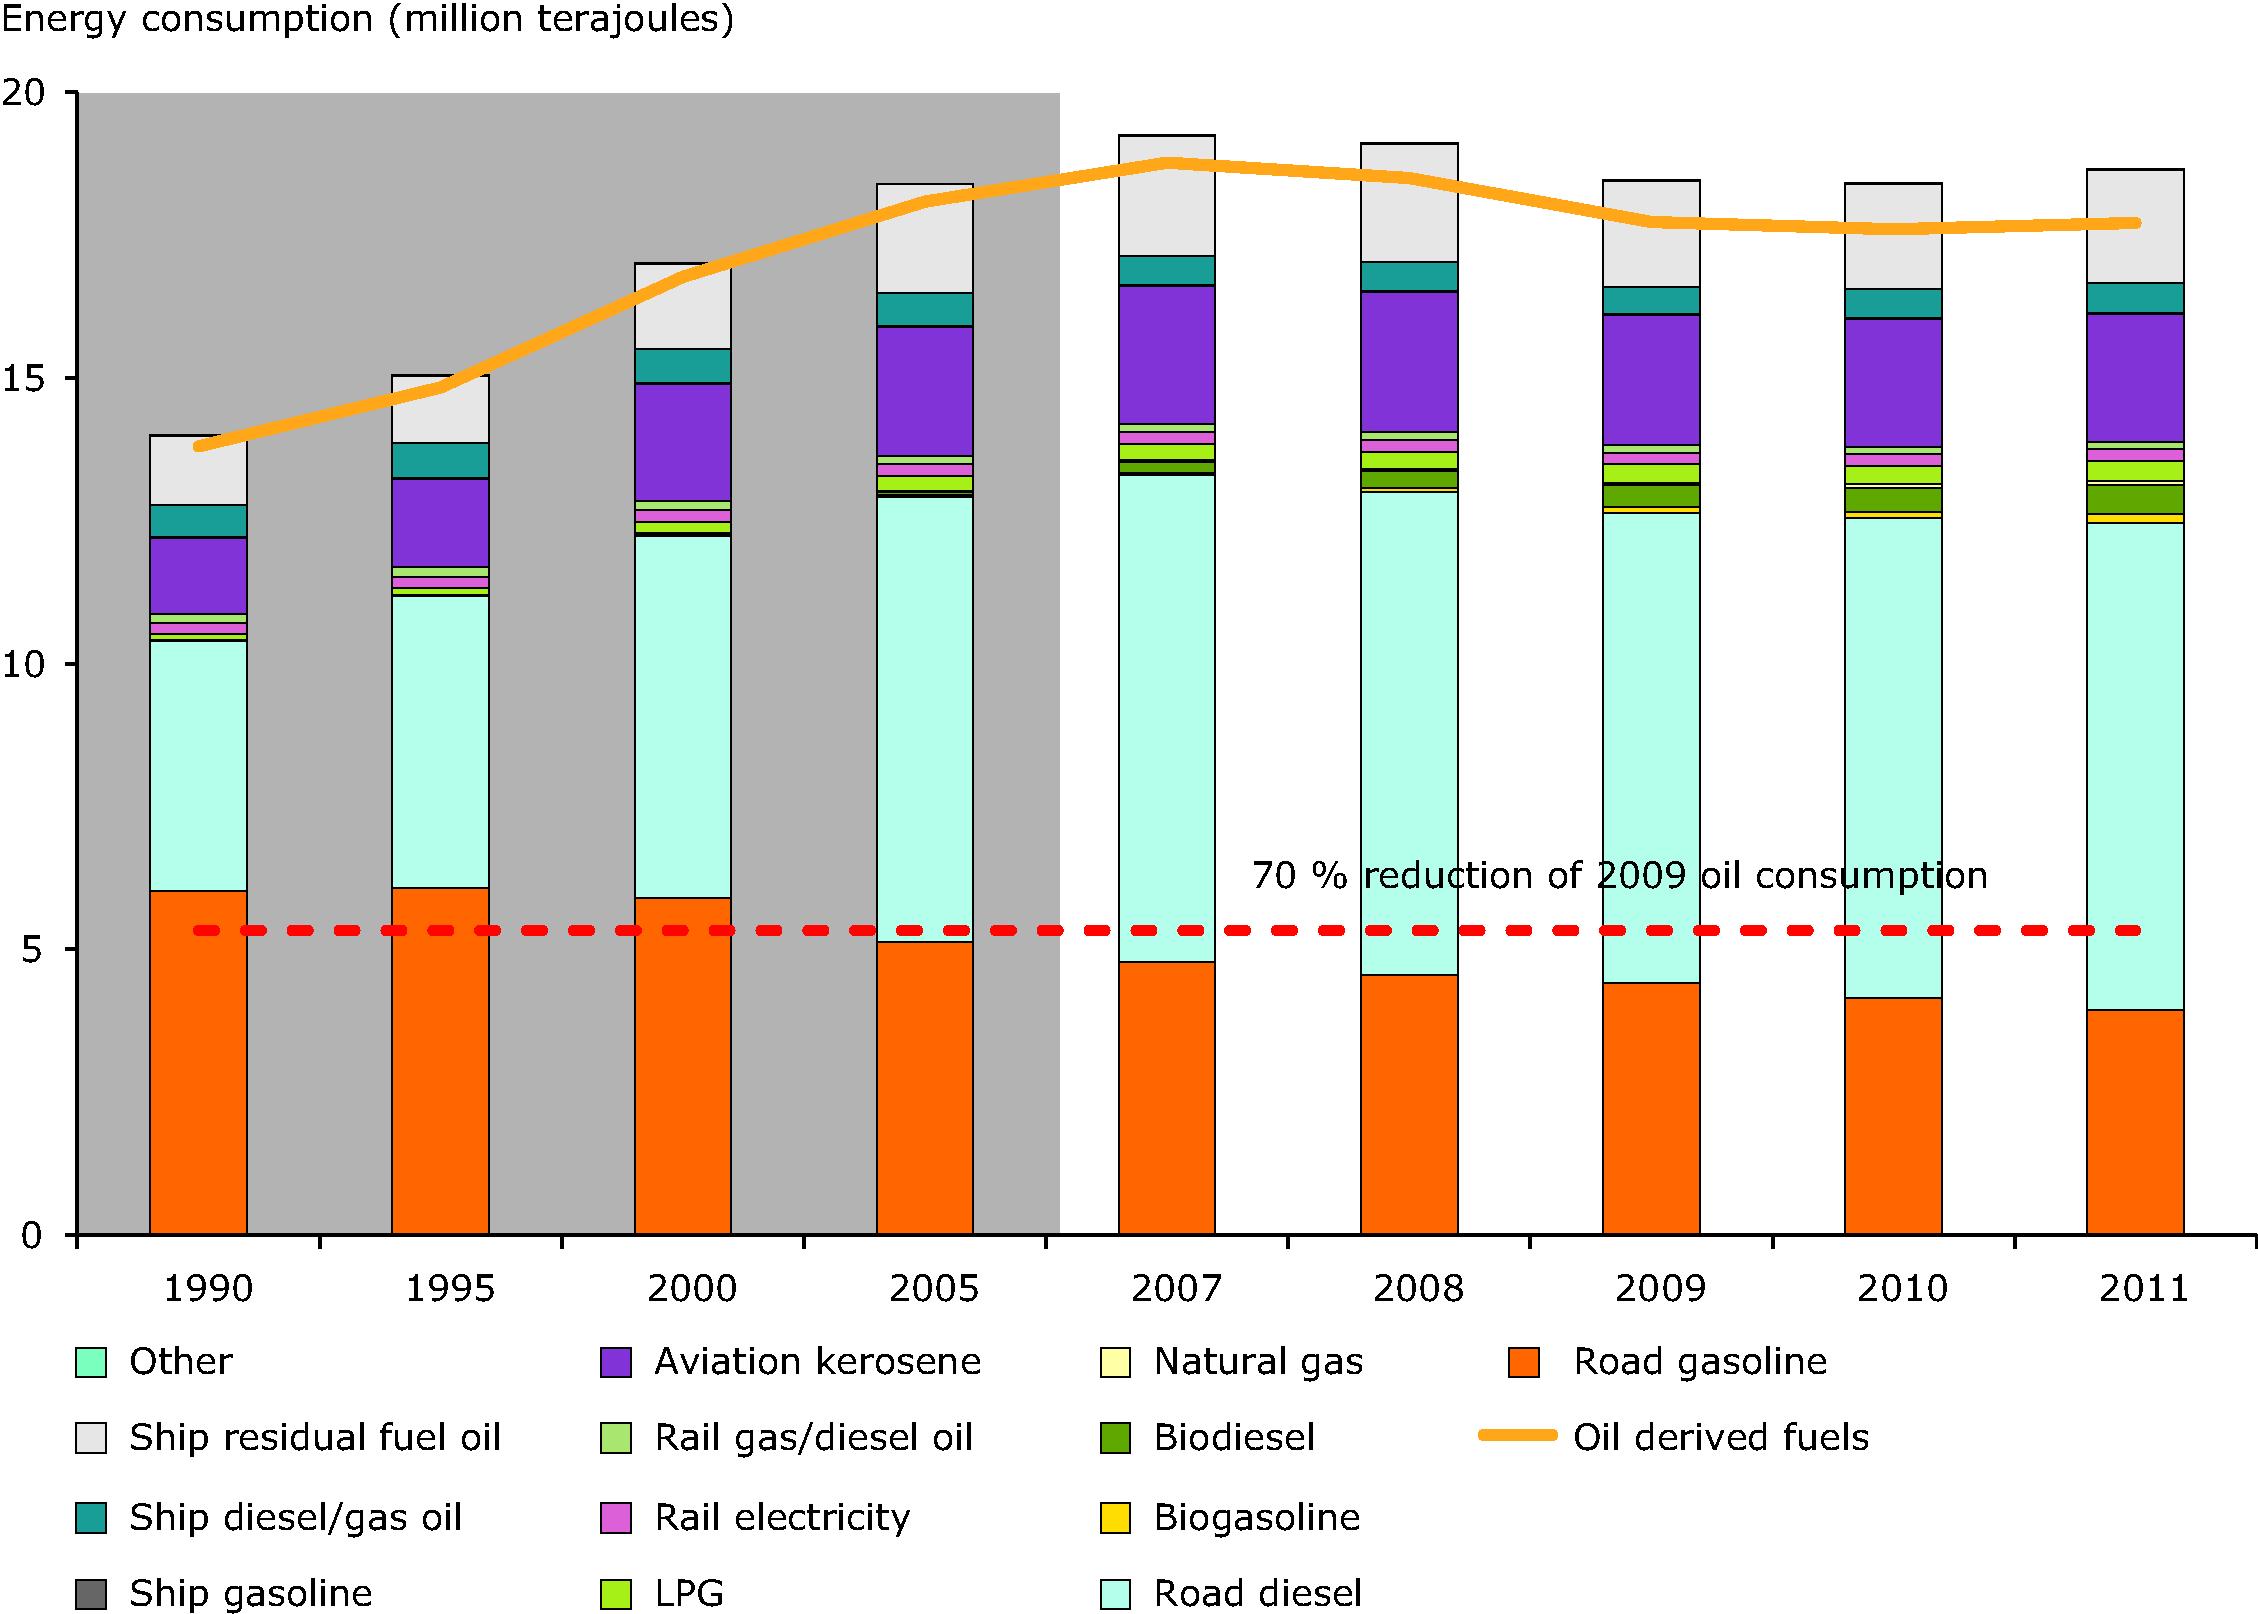 Transport energy consumption (EEA-32 excluding Iceland and Liechtenstein)